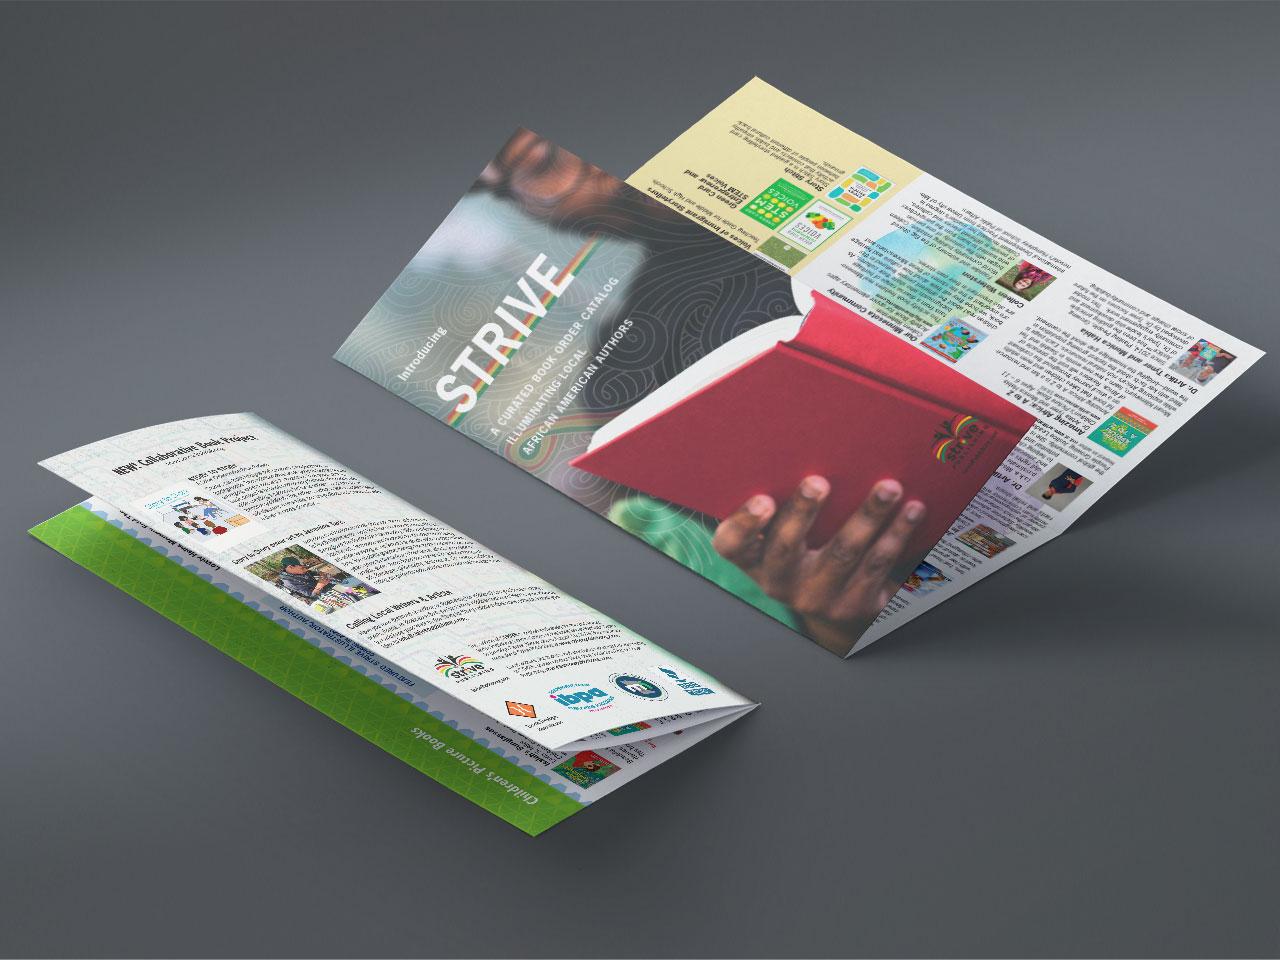 Strive book catalog, an oversized tri-fold